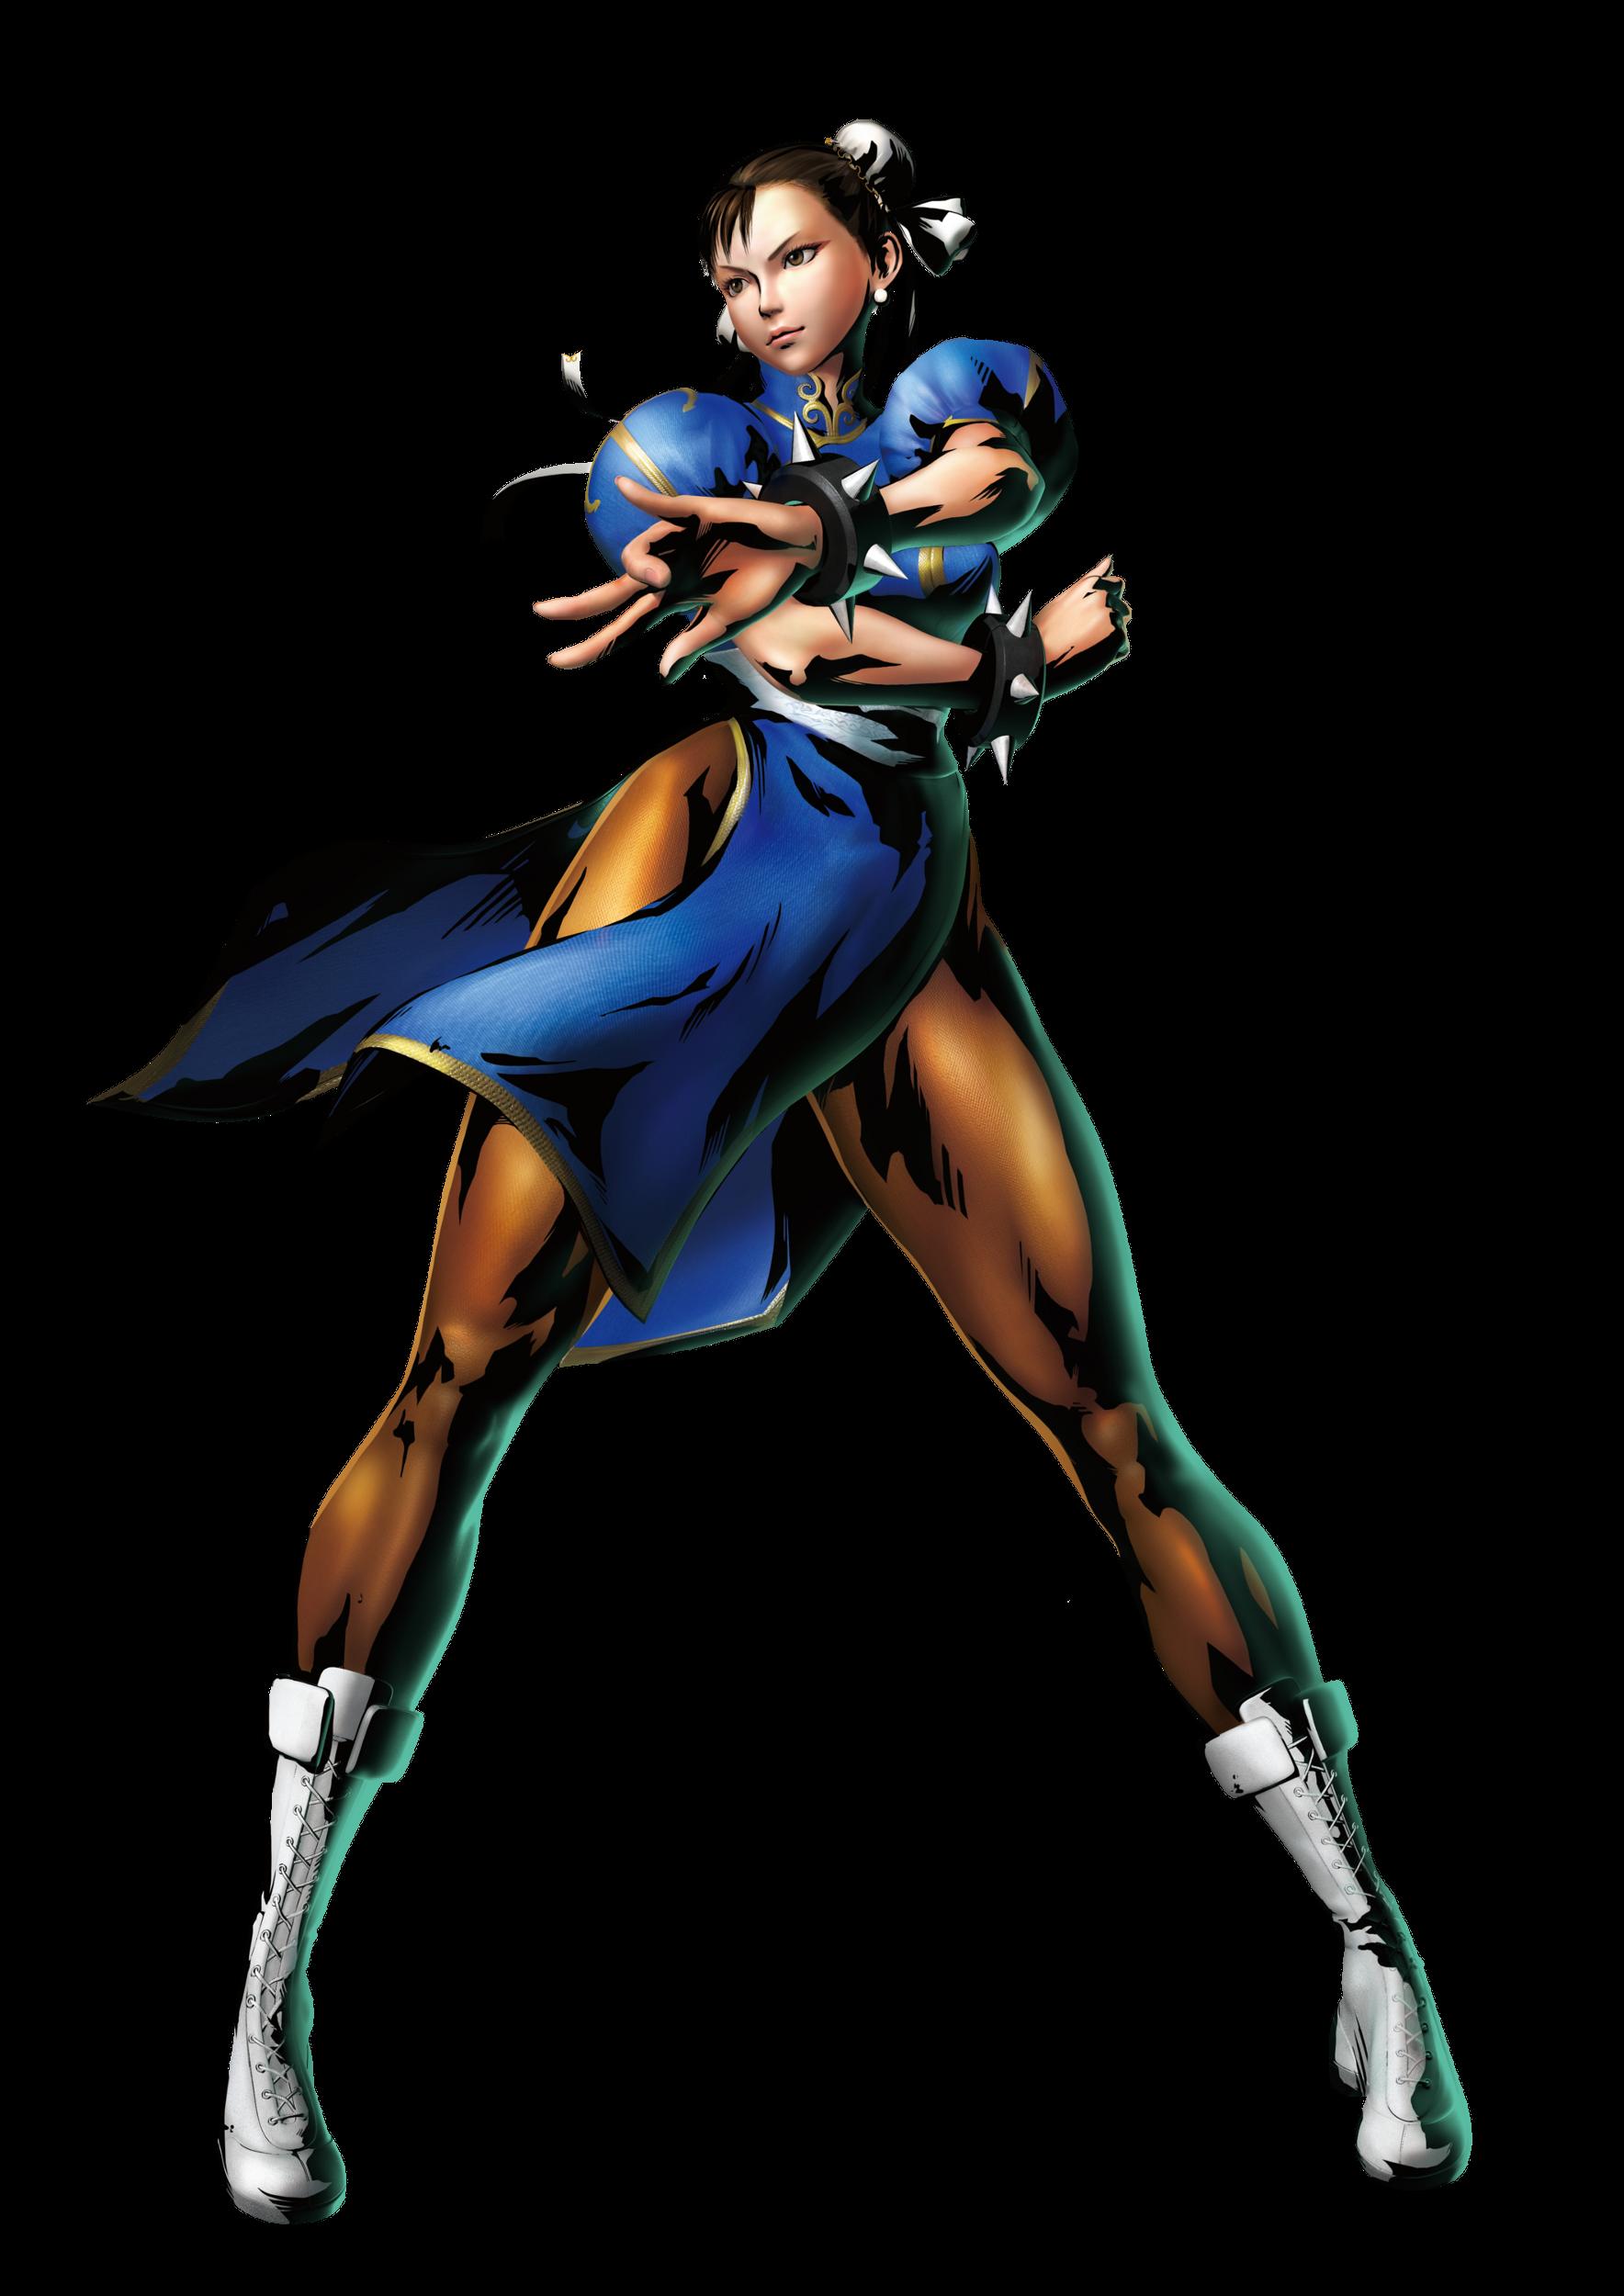 Http Www Renders Graphiques Fr Image Upload Normal Marvel Vs Capcom 3 2 Png Marvel Vs Chun Li Capcom Characters